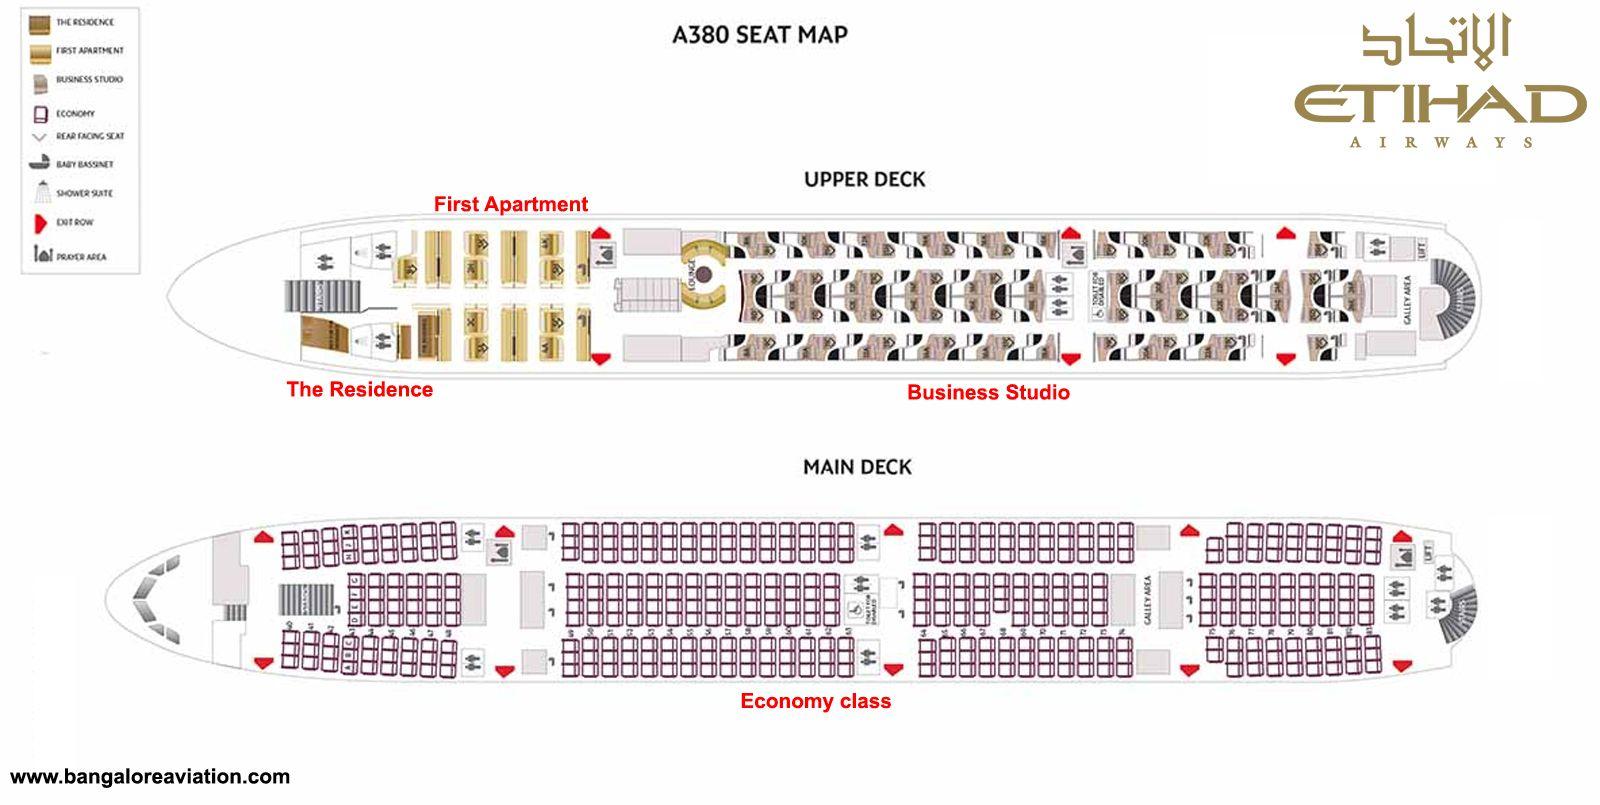 Etihad Airways A380 Seat Map Airbus A380 Airbus